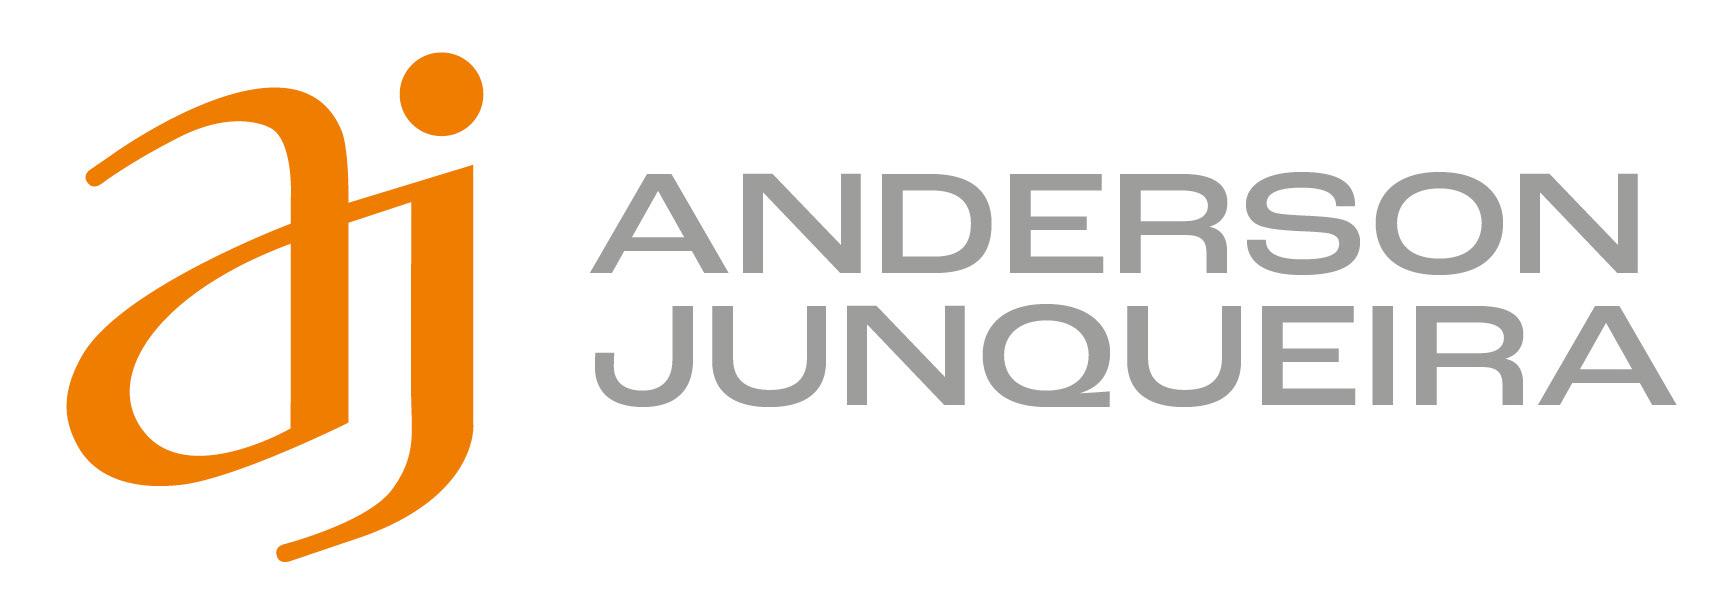 Anderson Junqueira